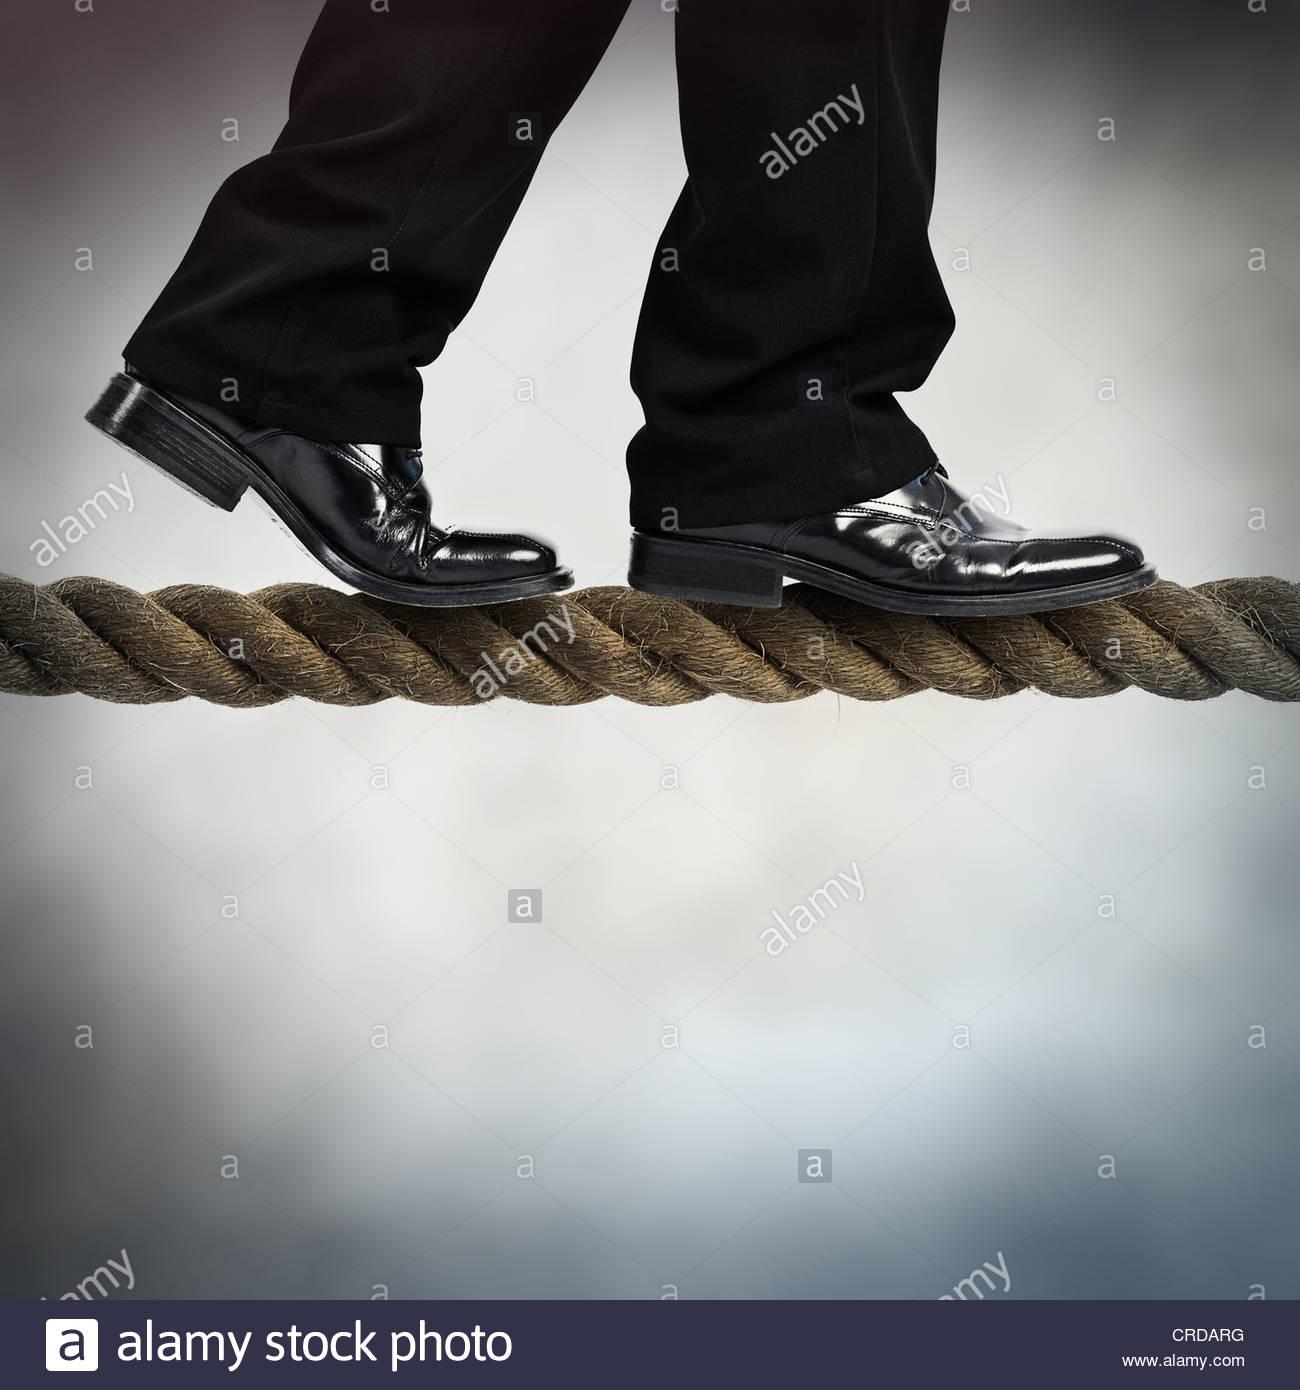 tightrope walk - Stock Image